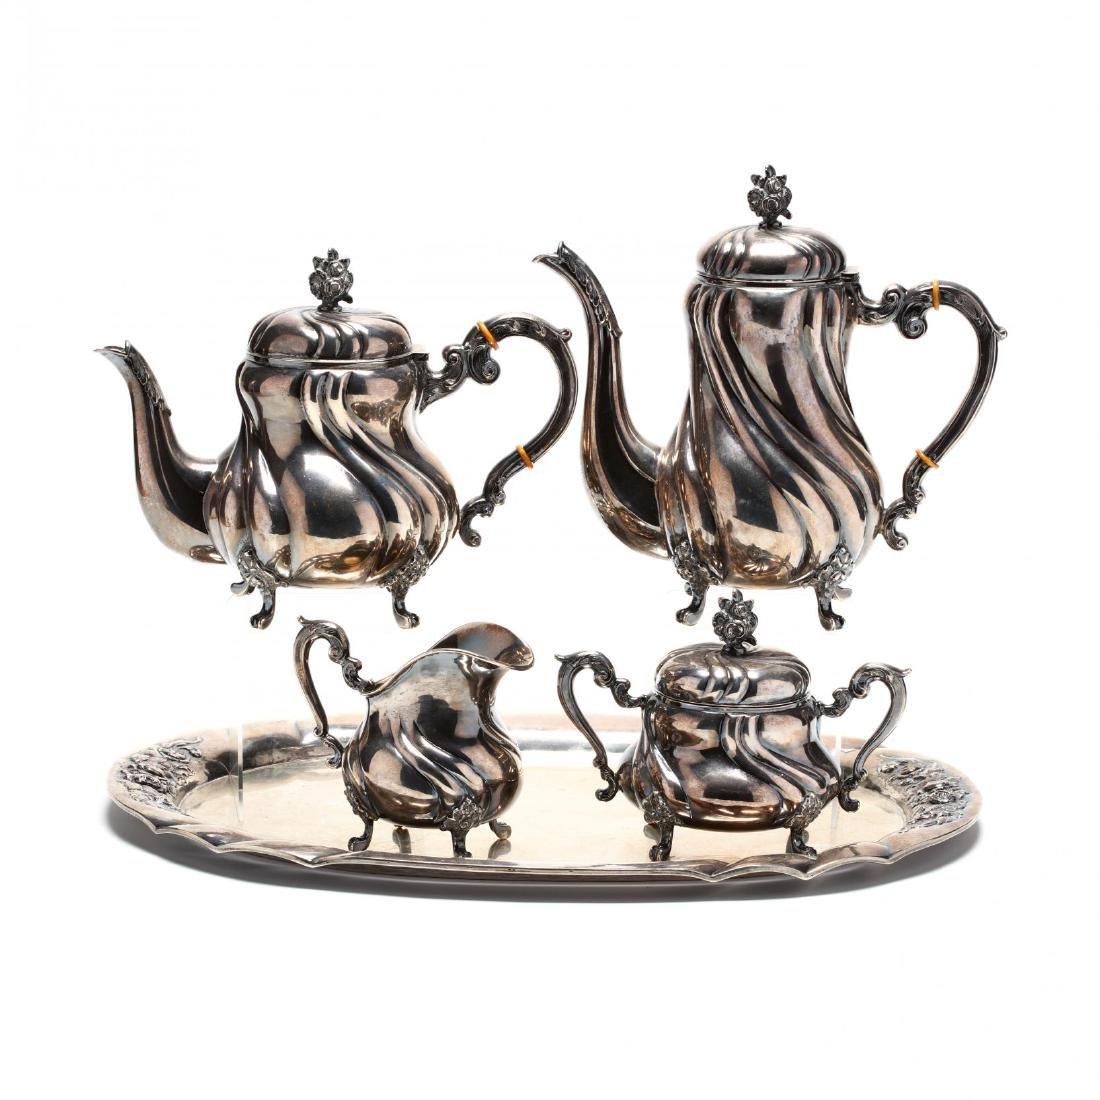 A Vintage Sterling Silver Tea & Coffee Service, German